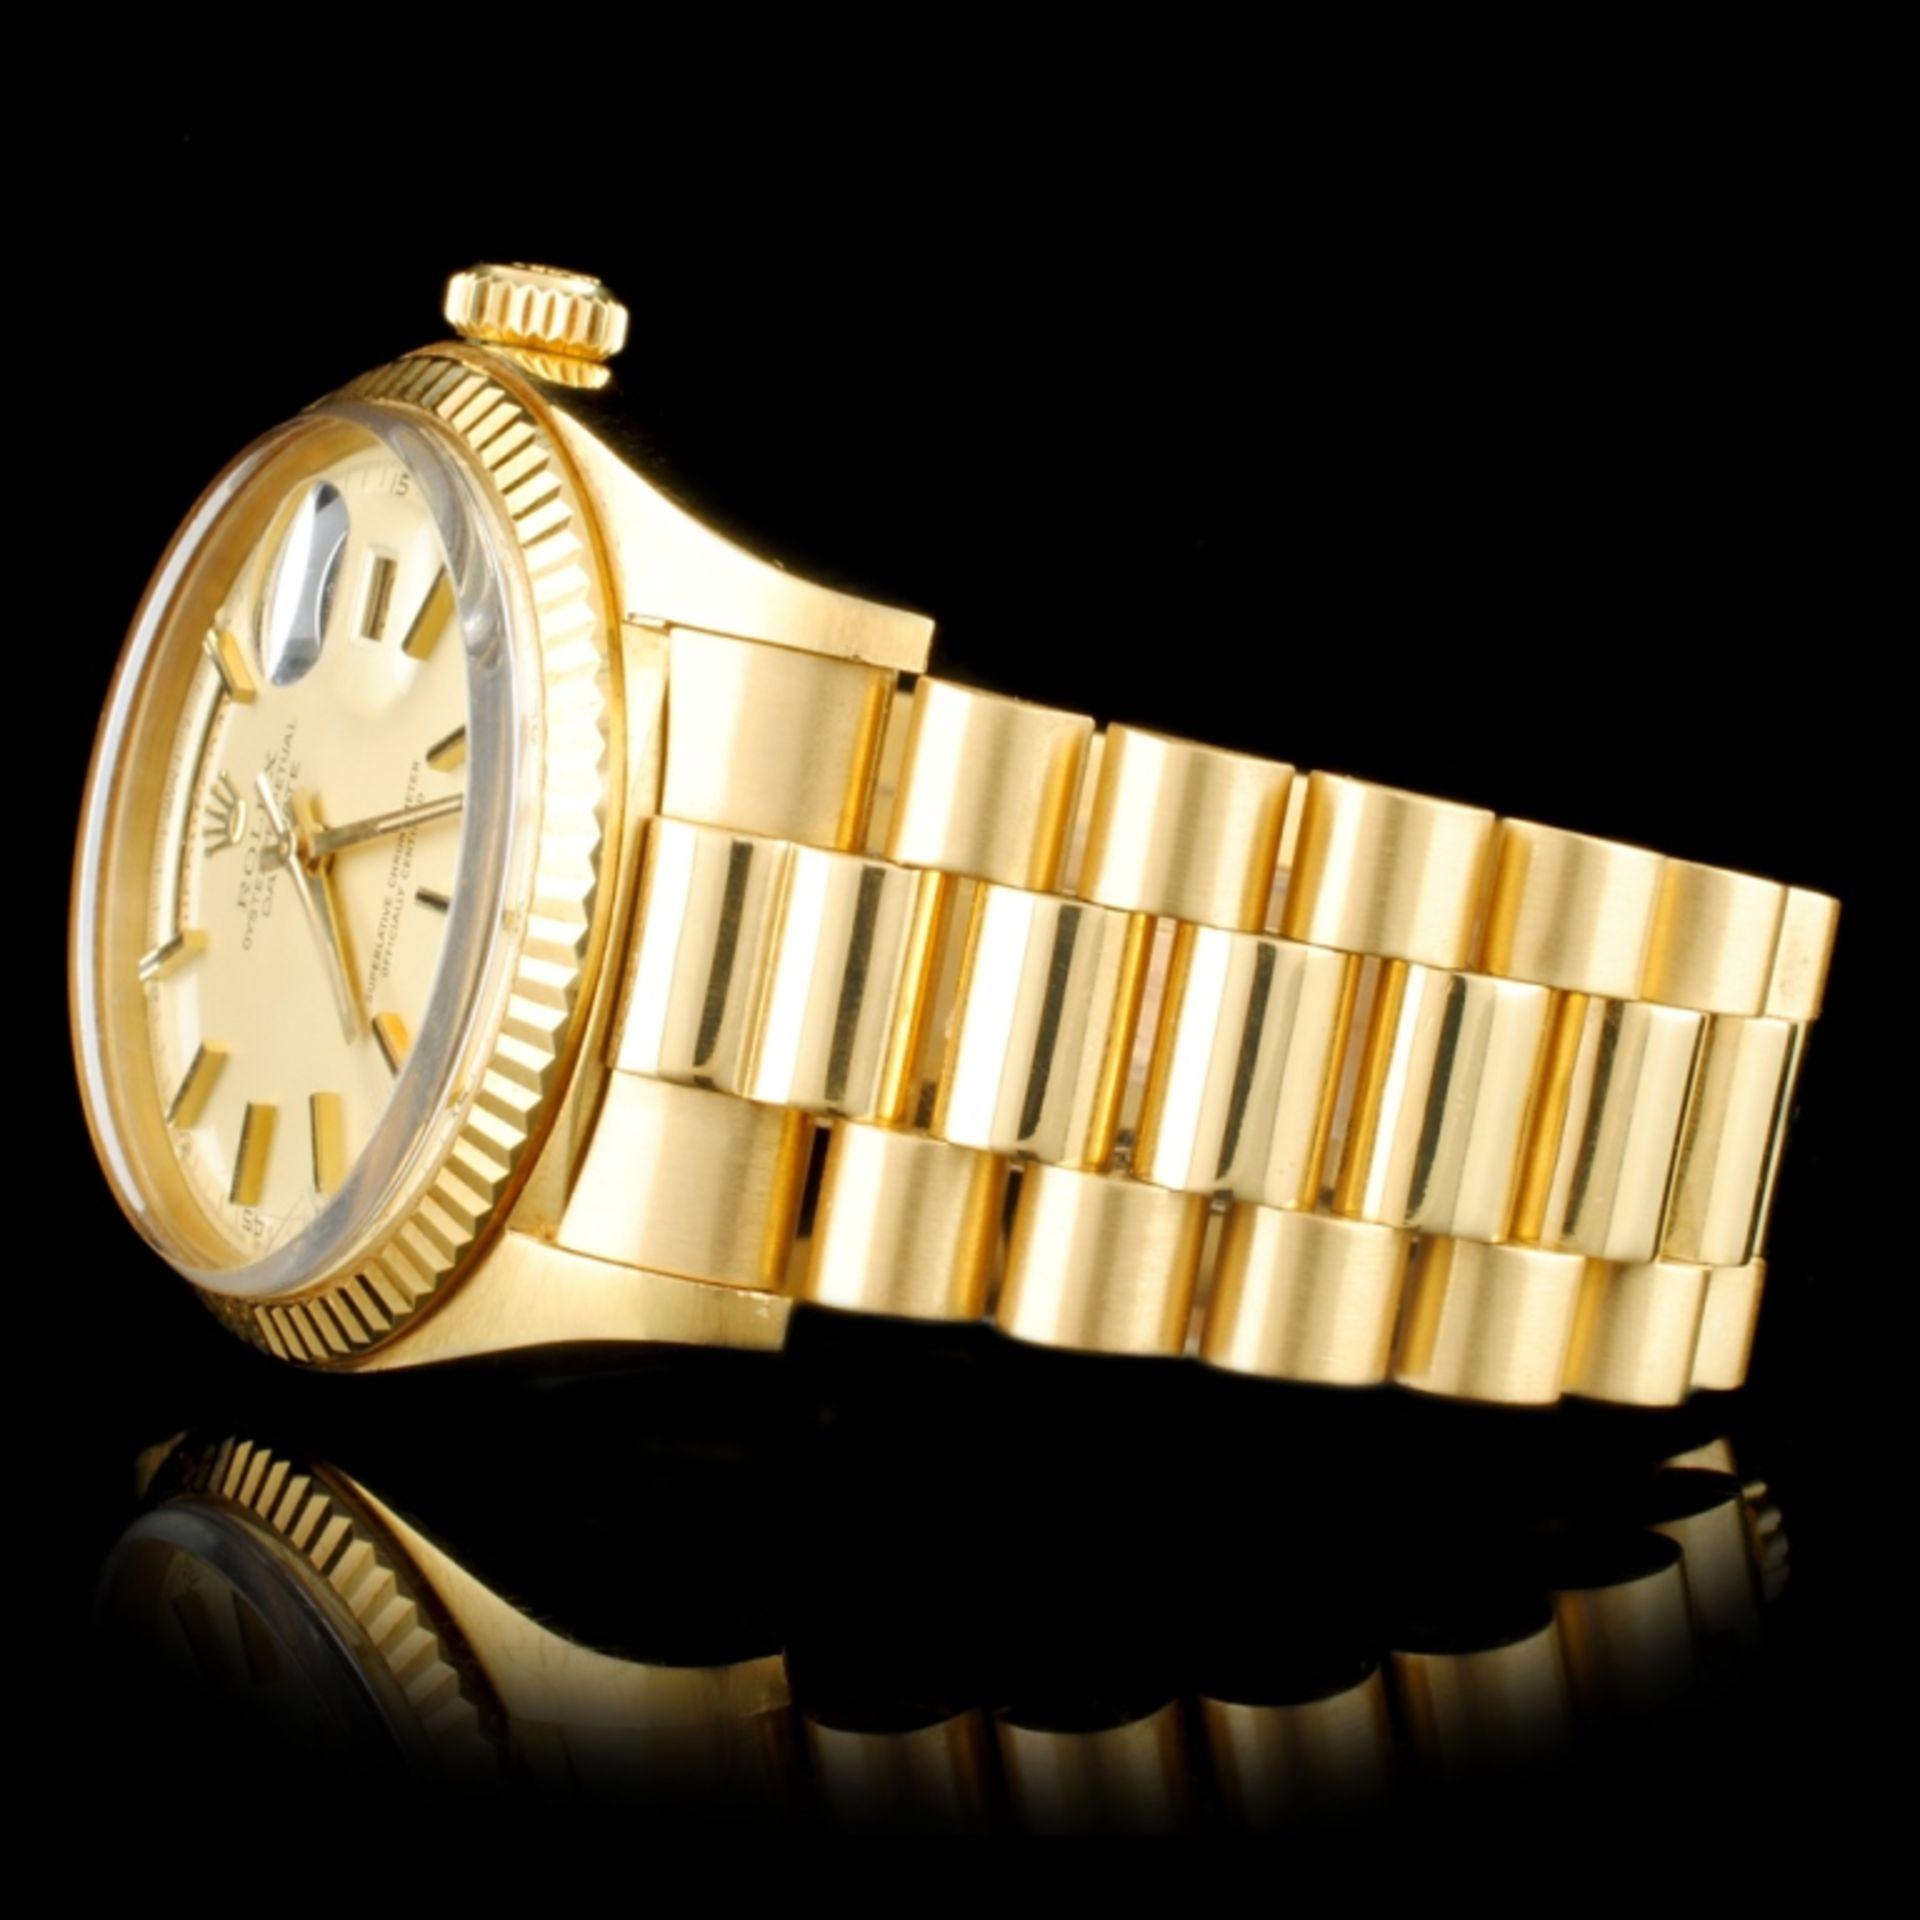 Rolex Day-Date 18K YG 36MM Wristwatch - Image 3 of 6